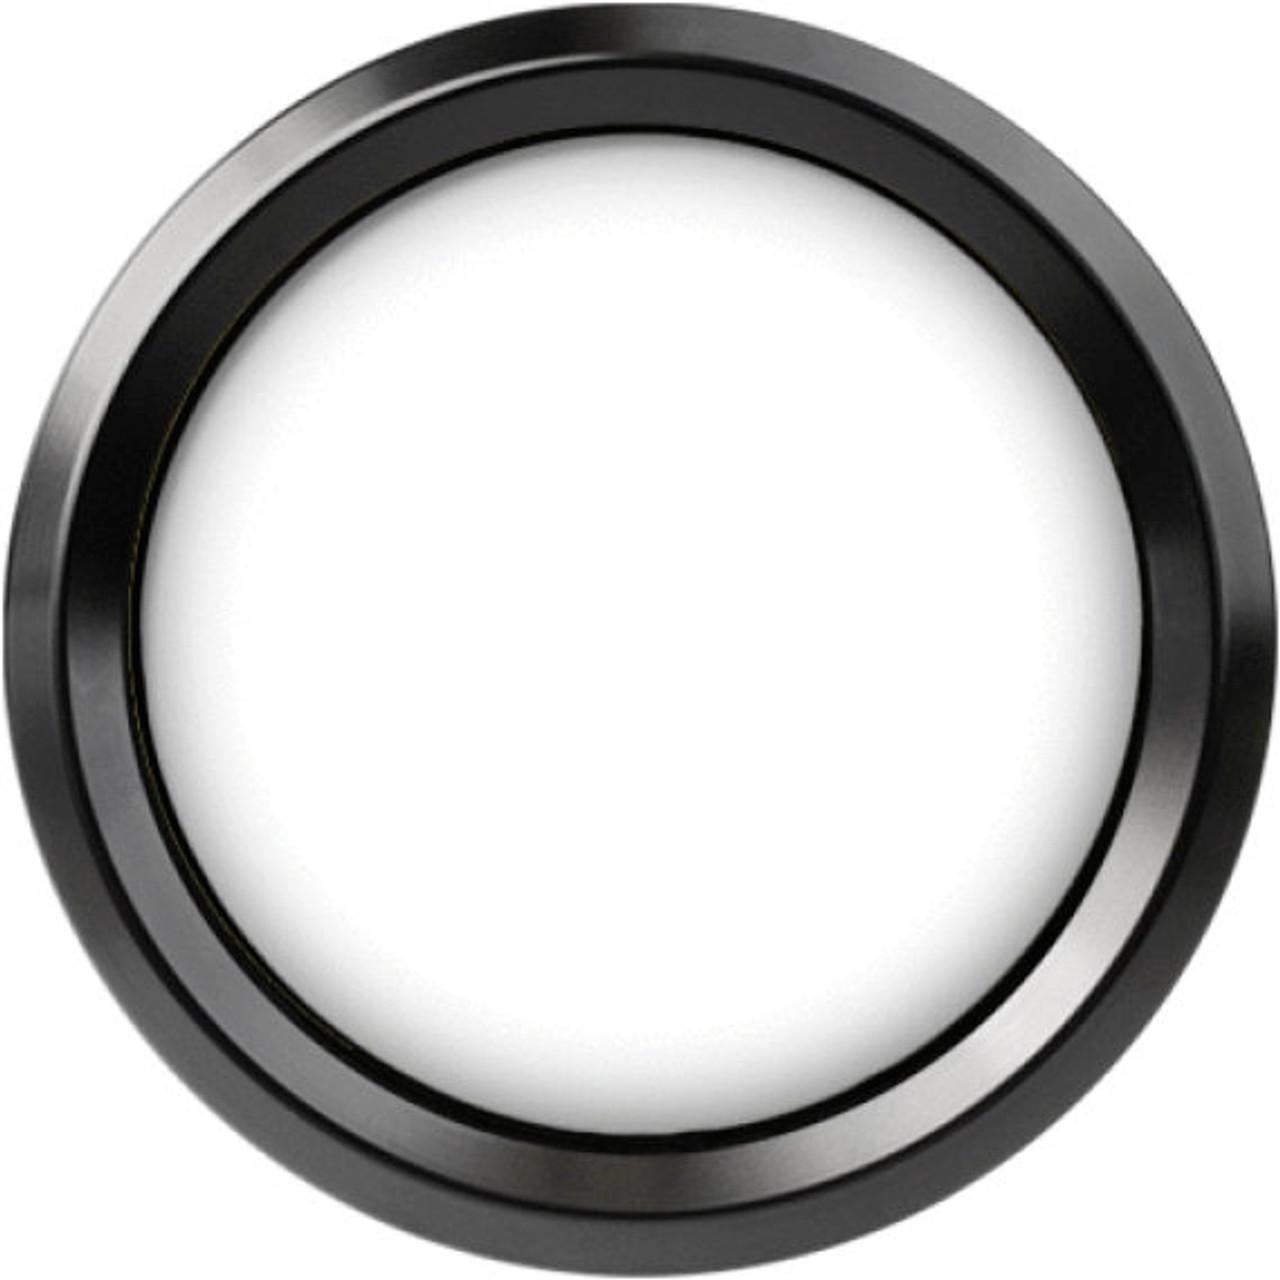 "Stealth Black Replacement Bezel for 2-5/8"" gauge"